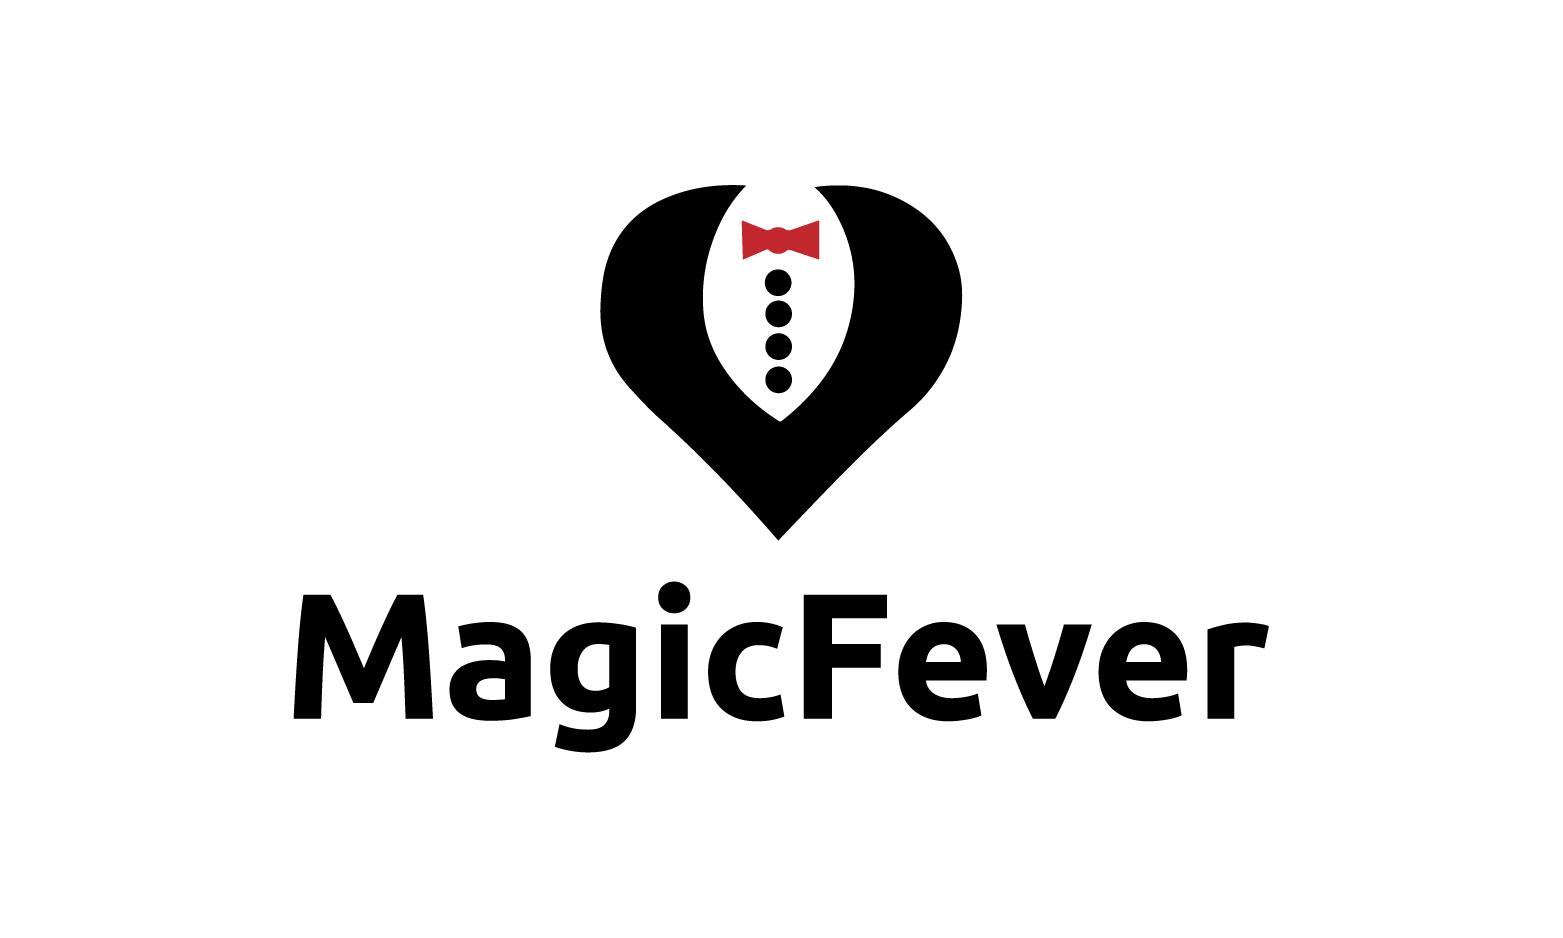 MagicFever.com